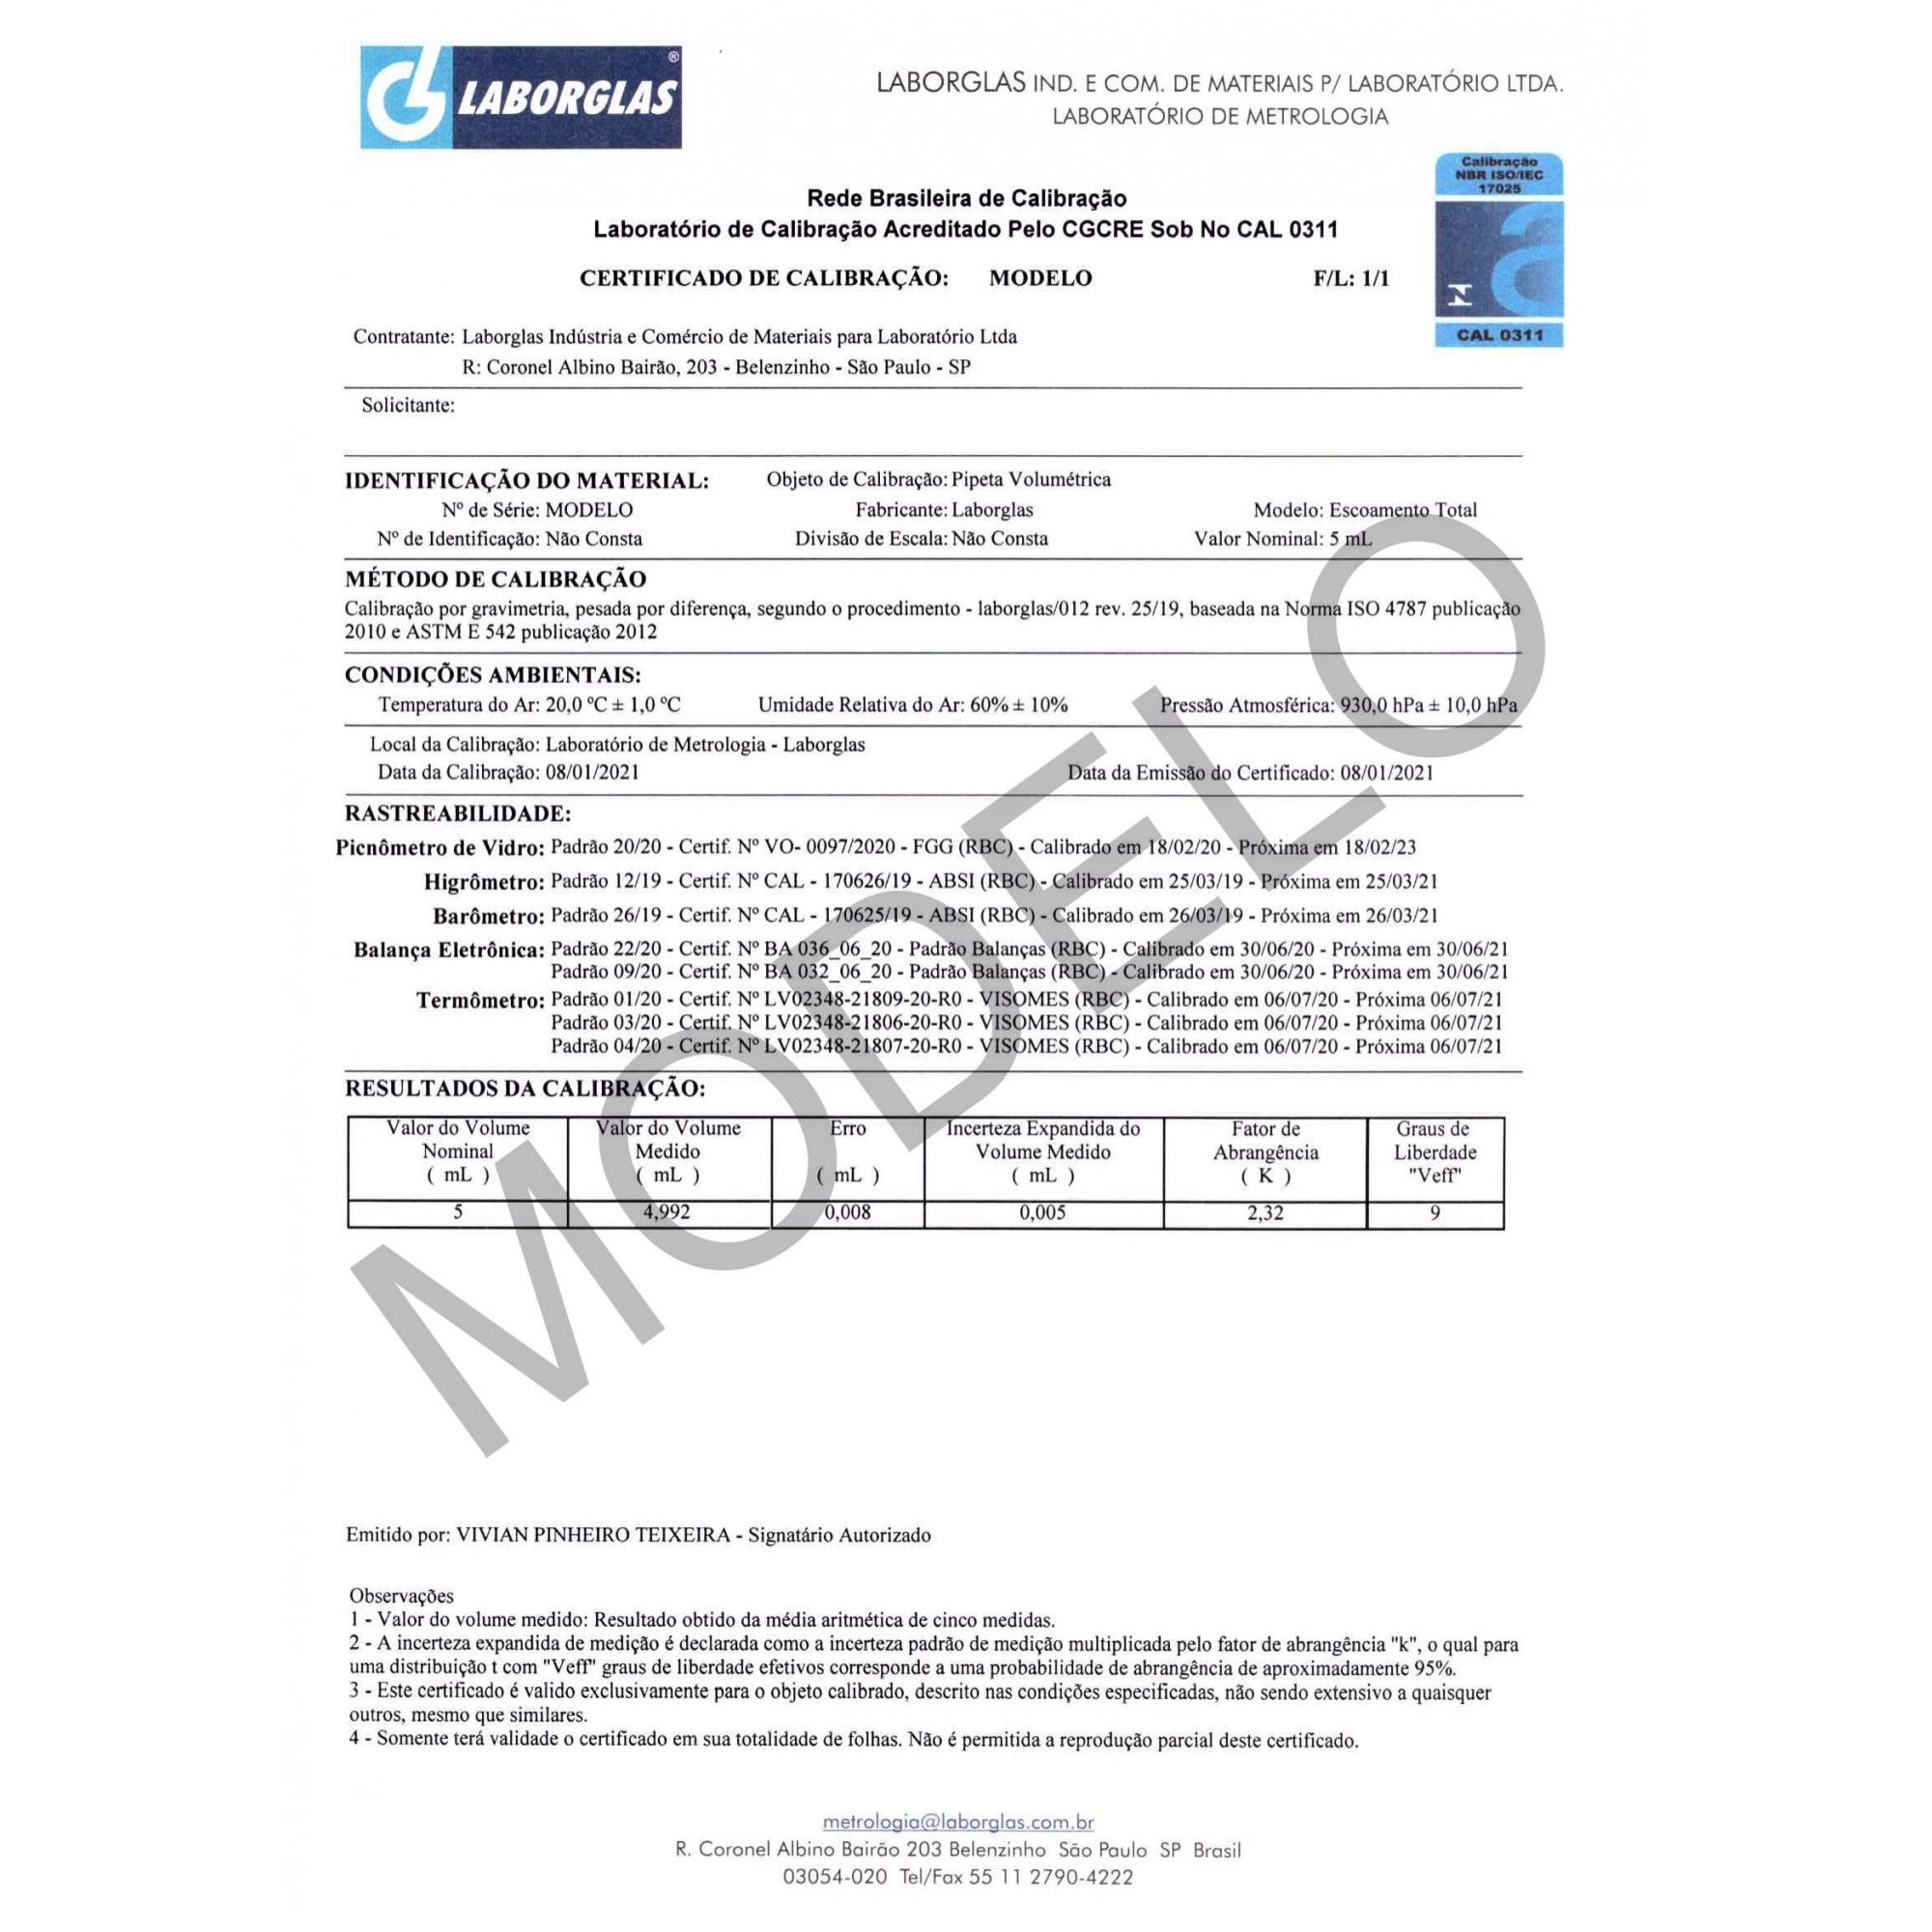 PIPETA VOLUMÉTRICA ESGOTAMENTO TOTAL 2 ML CERTIFICADO RBC - Laborglas - Cód. 9433703-R